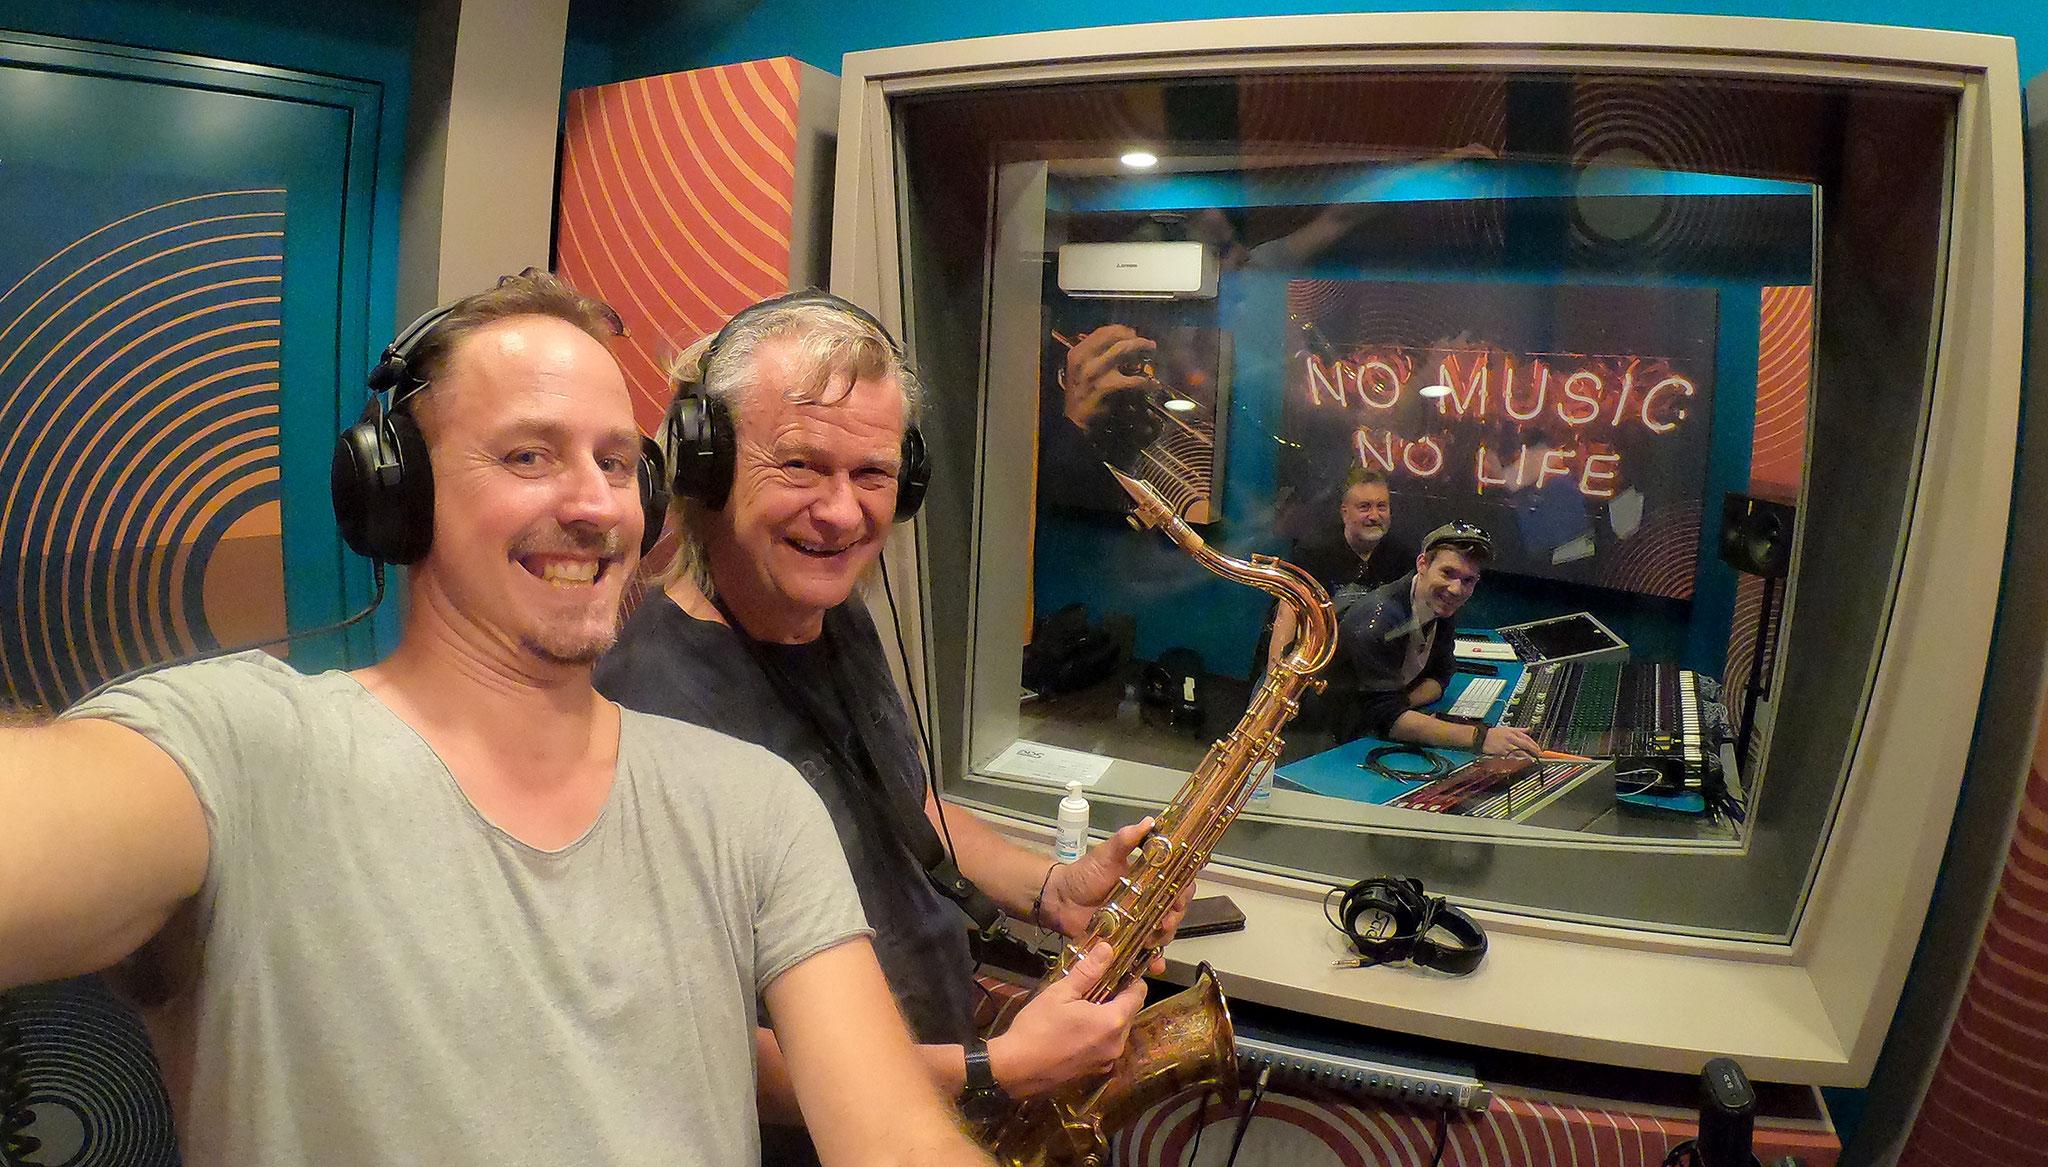 dirty old men recording sae vienna 1010 - 24th July 2020 - Wolfgang Medlitsch & Markus Jimi Ivan